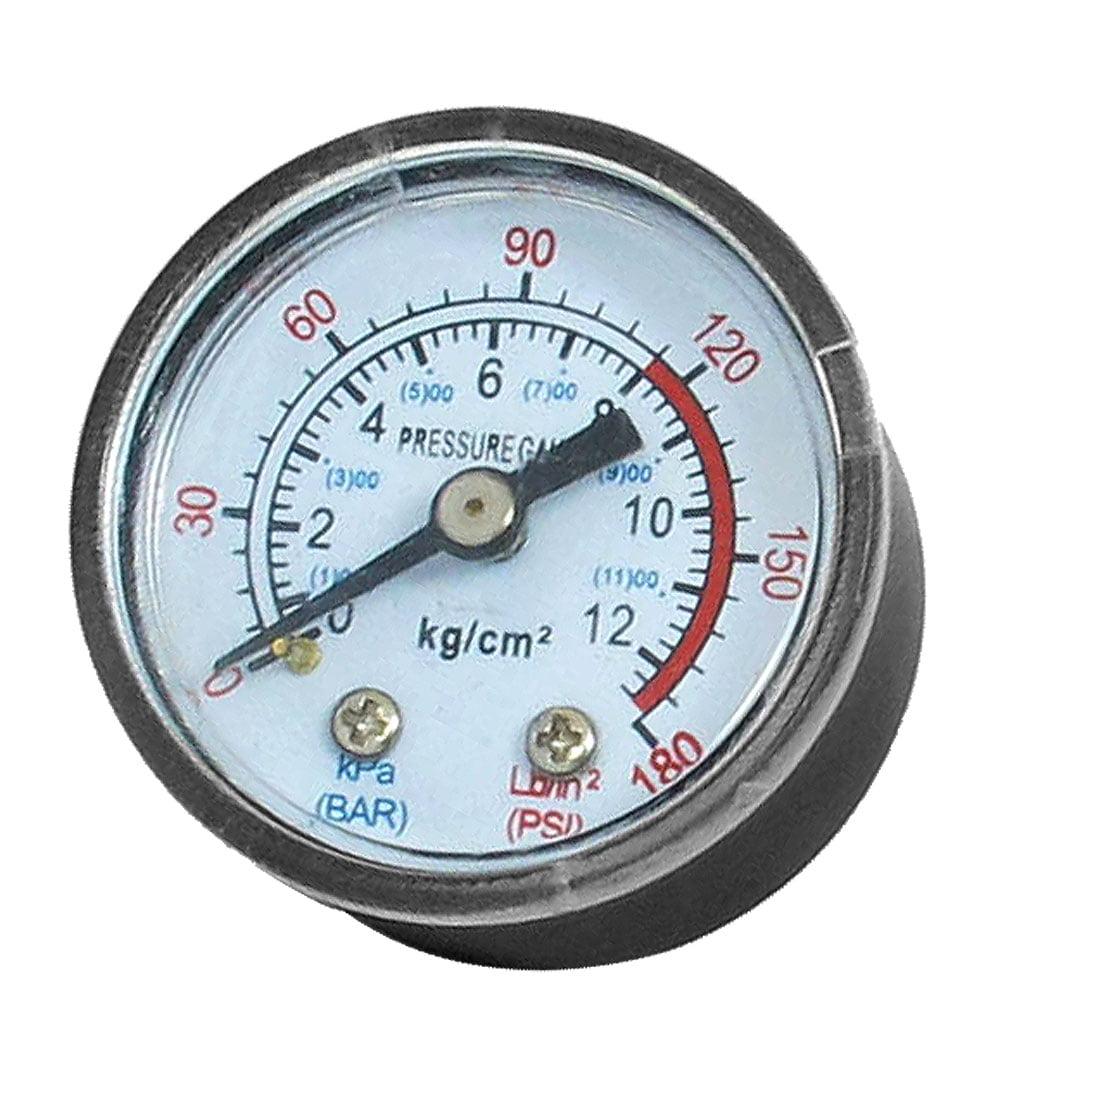 Unique Bargains 1/8BSP Air Compressor Hydraulic Back Mount Pressure Gauge 0-180 PSI